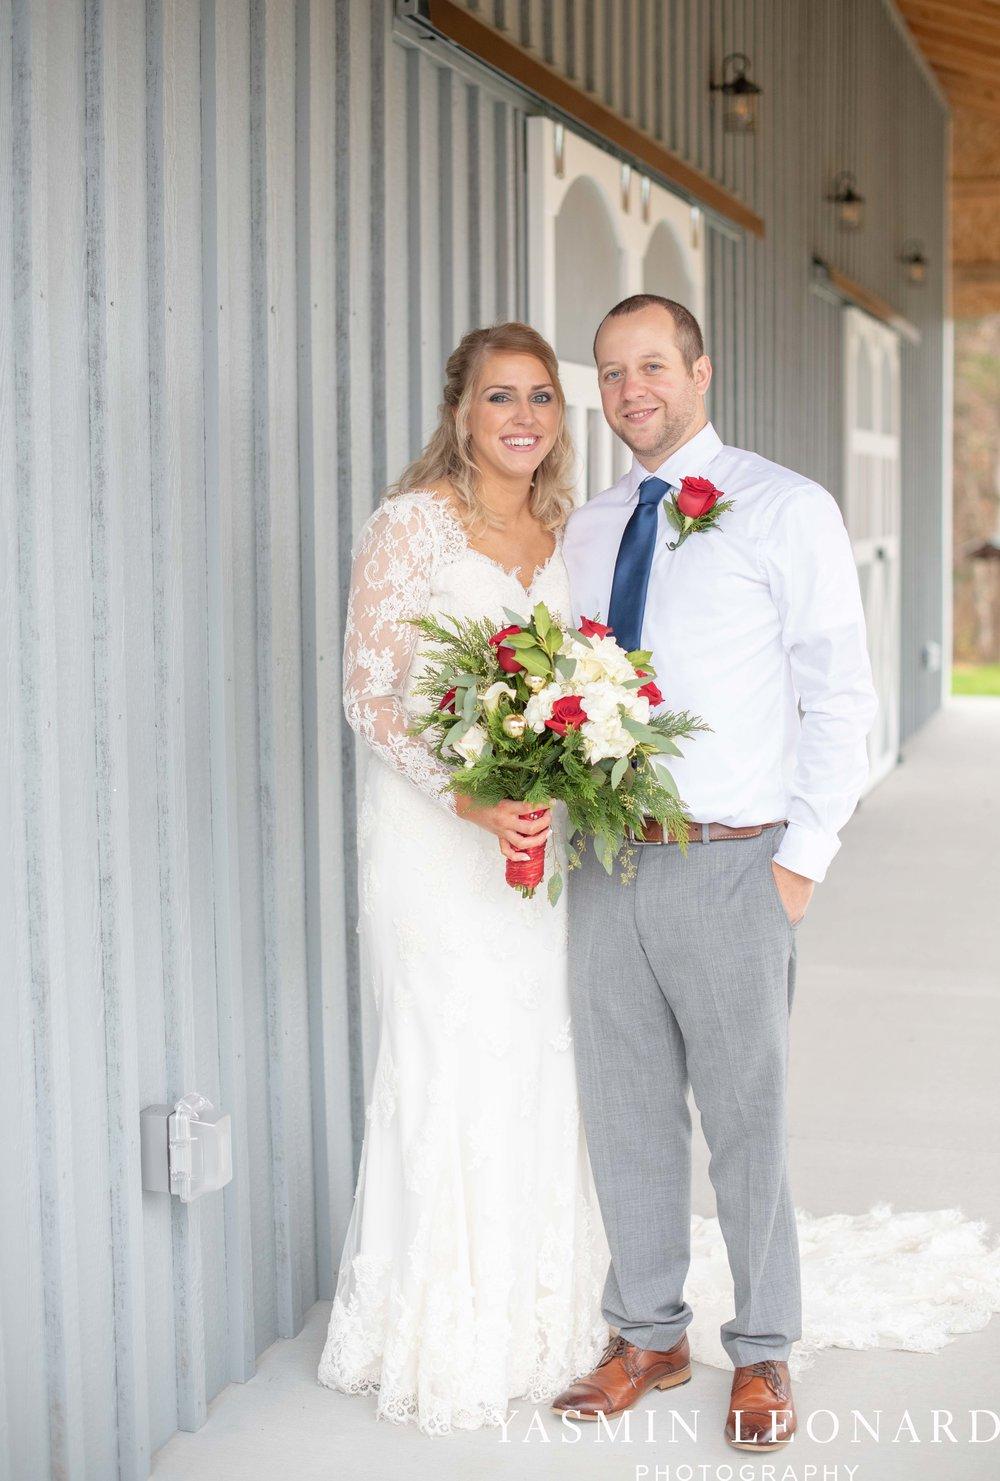 Secret Meadows at Green Dell Farm, NC Barns, NC Wedding Venues, Triad, NC, NC Wedding Photography, Triad Wedding Venues, Affordable Wedding Venues, NEW Wedding Venues, Christmas Weddings-26.jpg